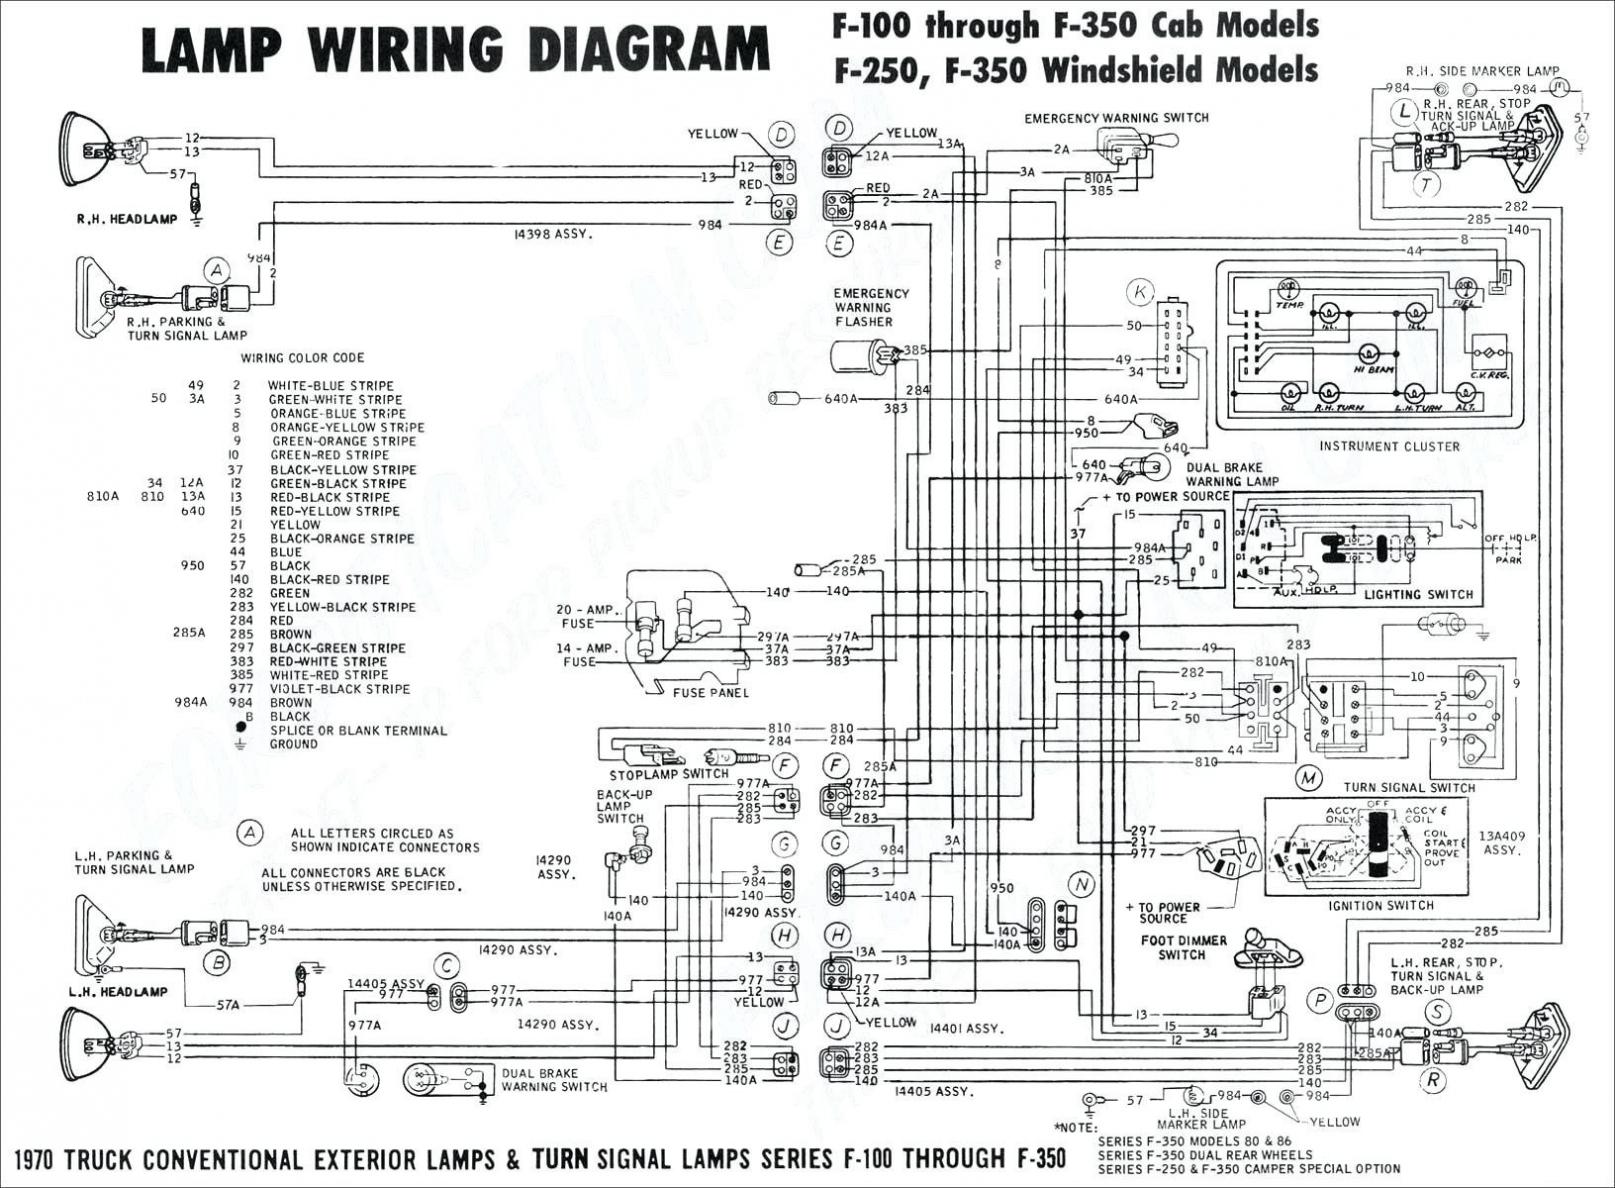 2004 F150 Trailer Wiring Diagram